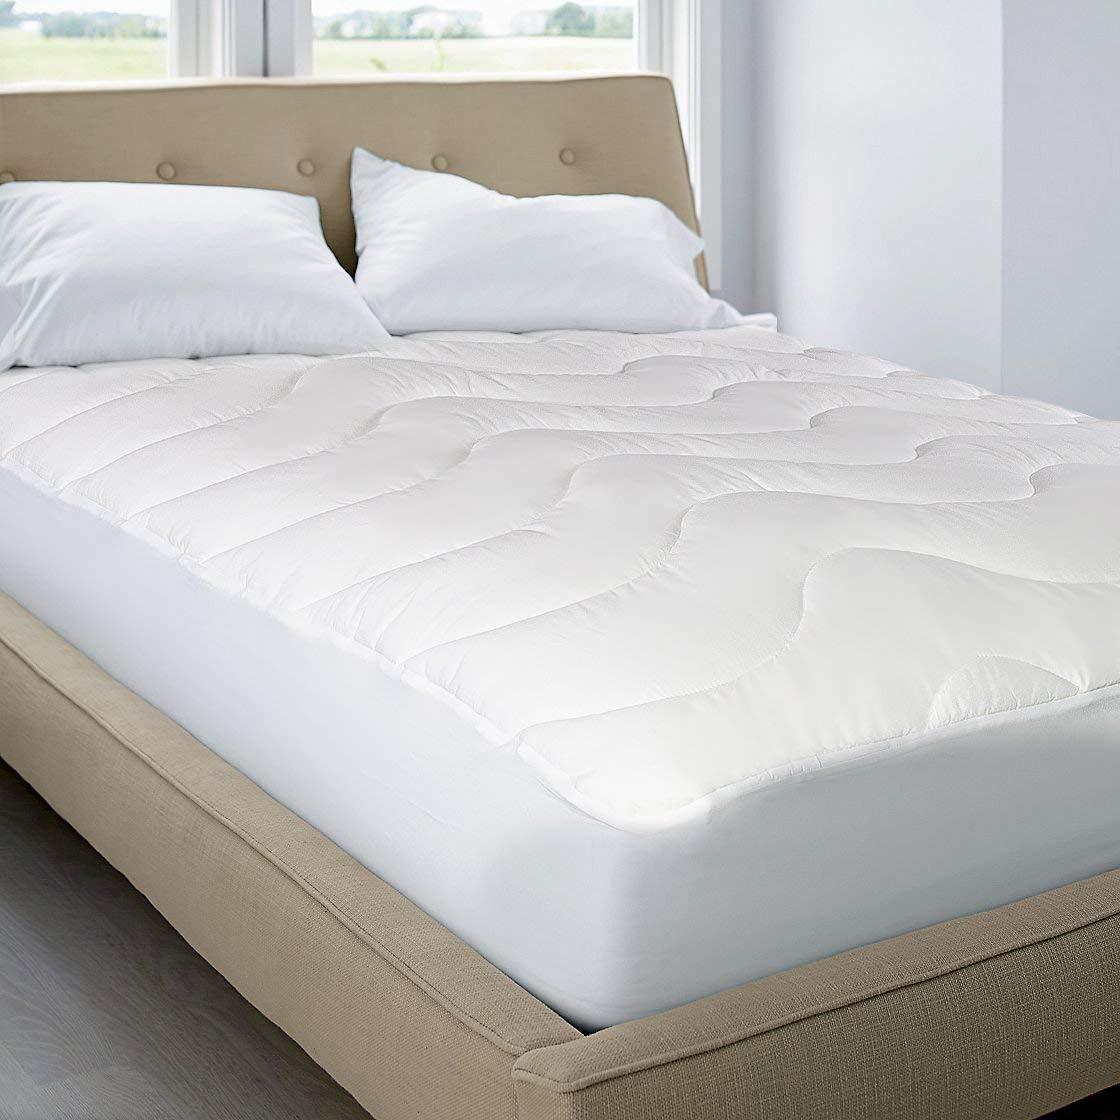 Blue Ridge Home Fashions 350 Thread Count Cotton Damask Dual Action Mattress Pad Queen White